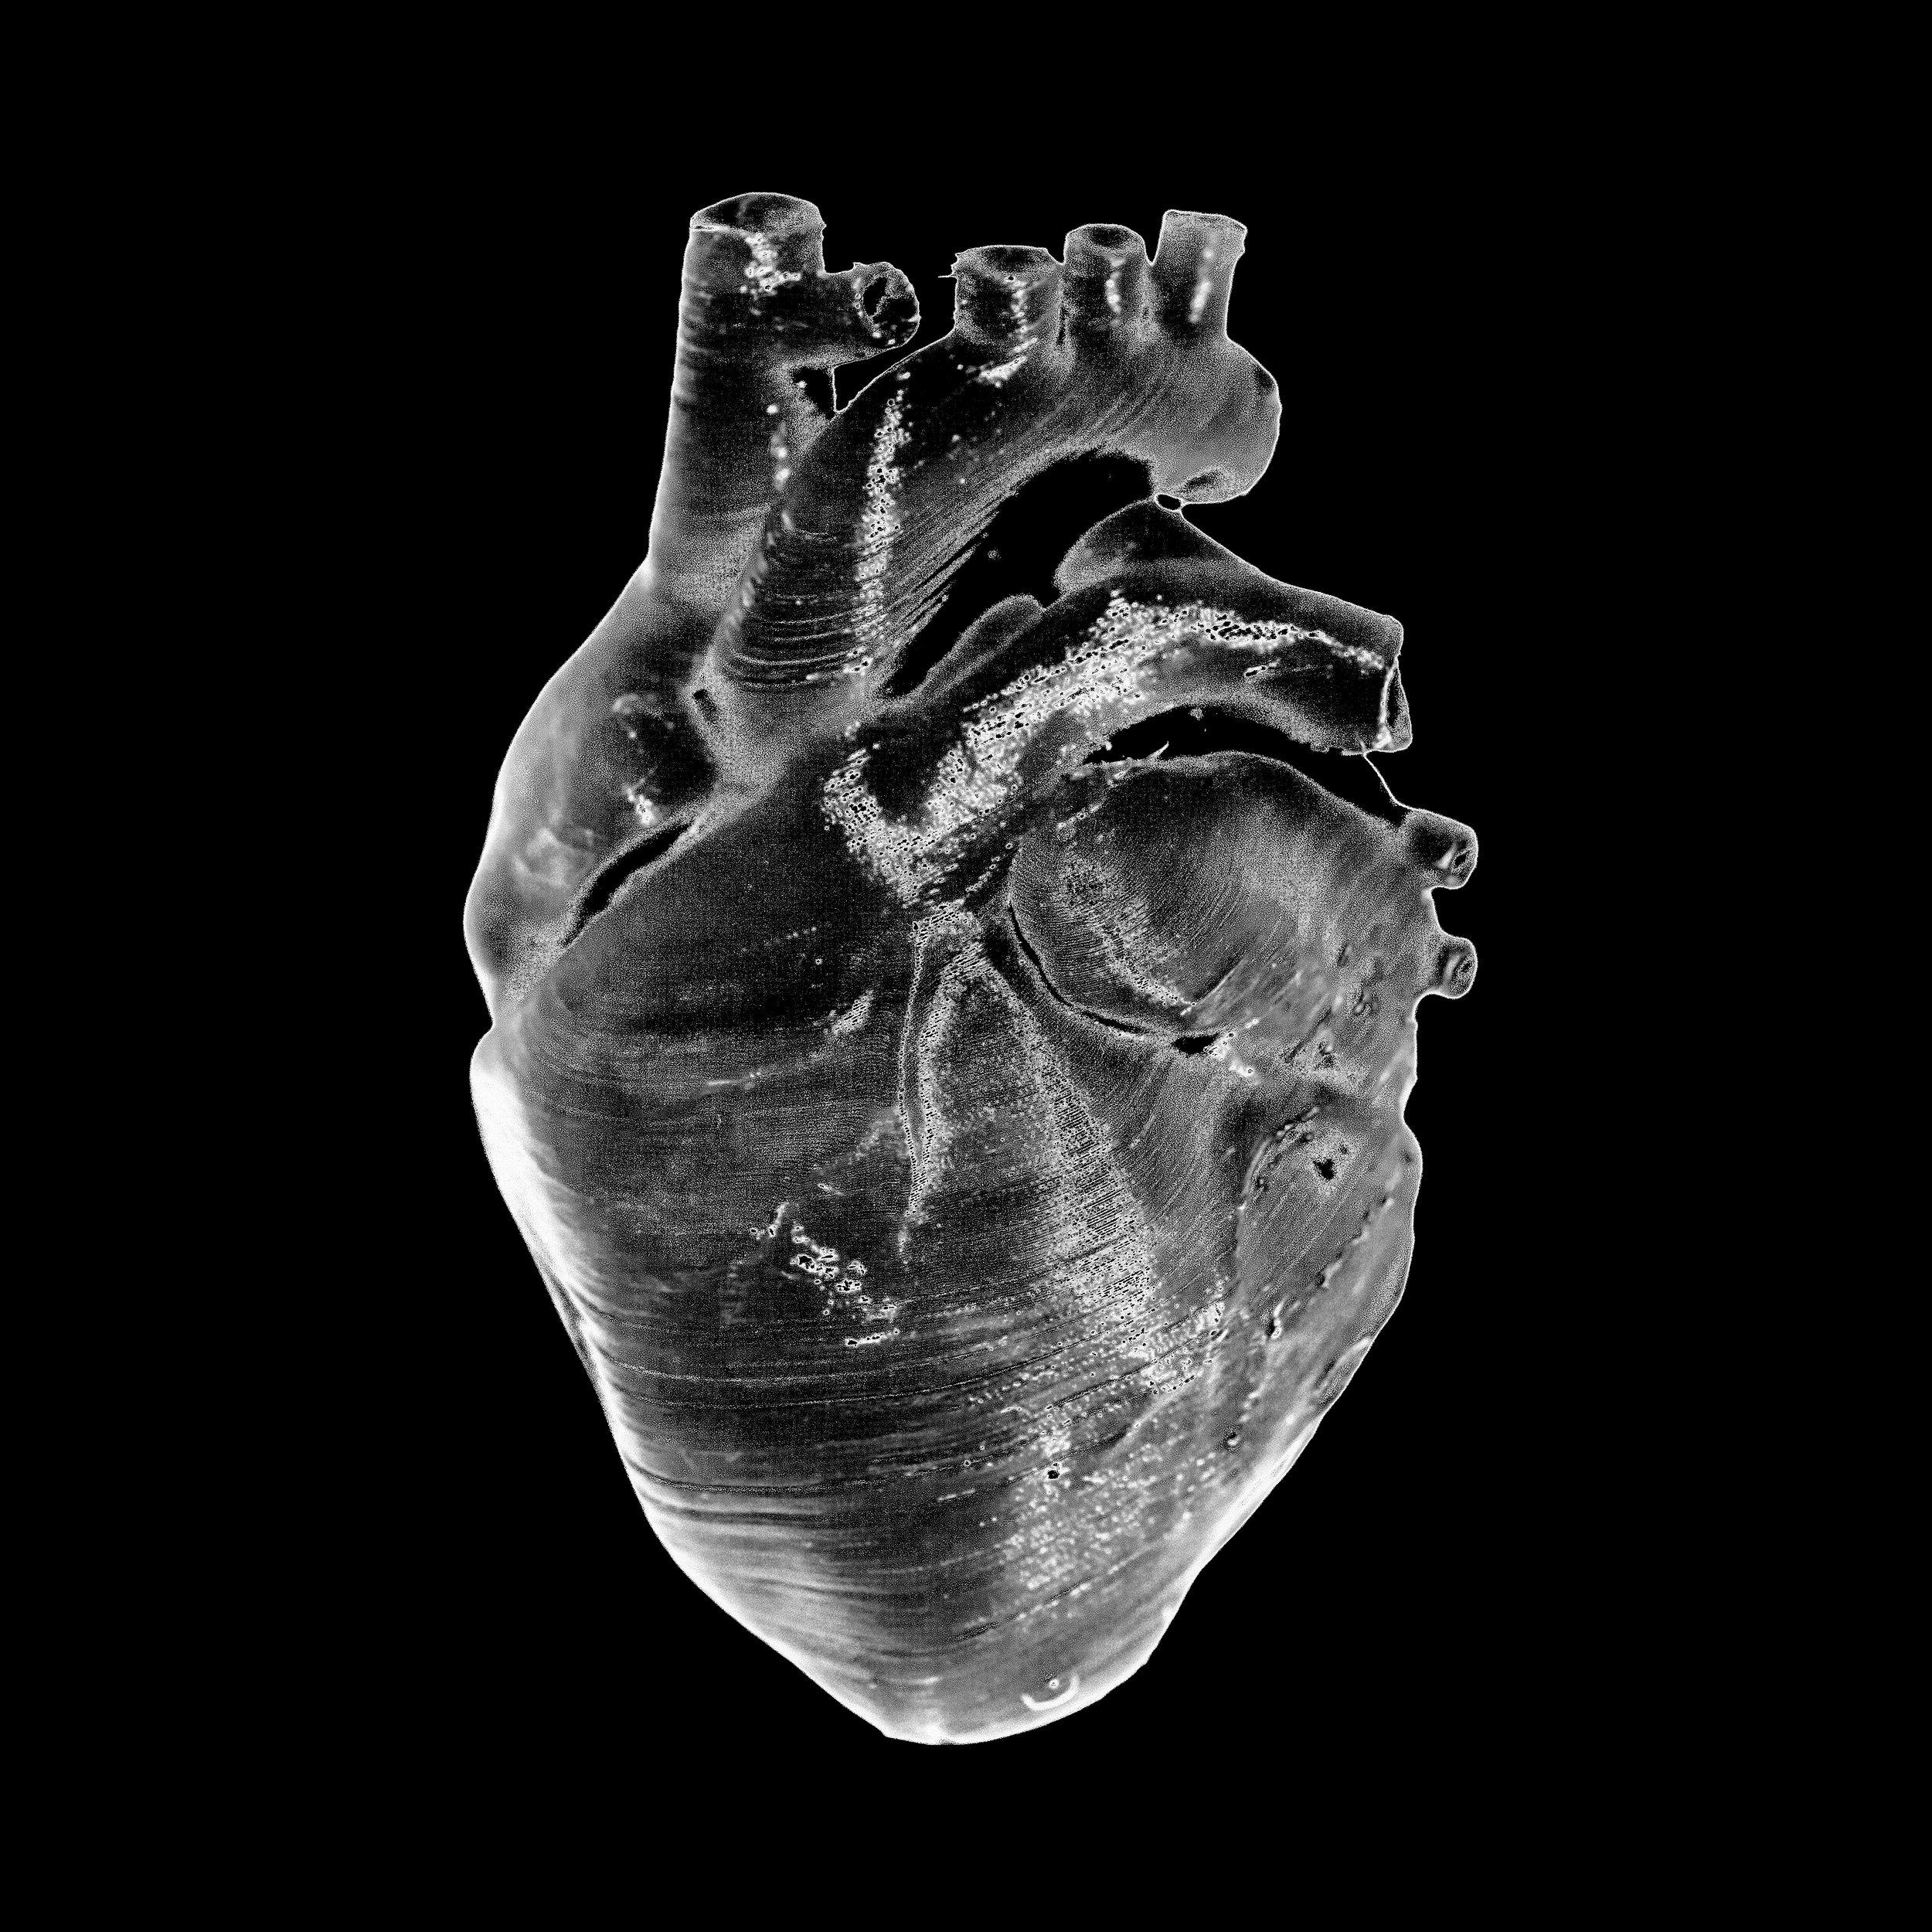 heart monochrome.JPG